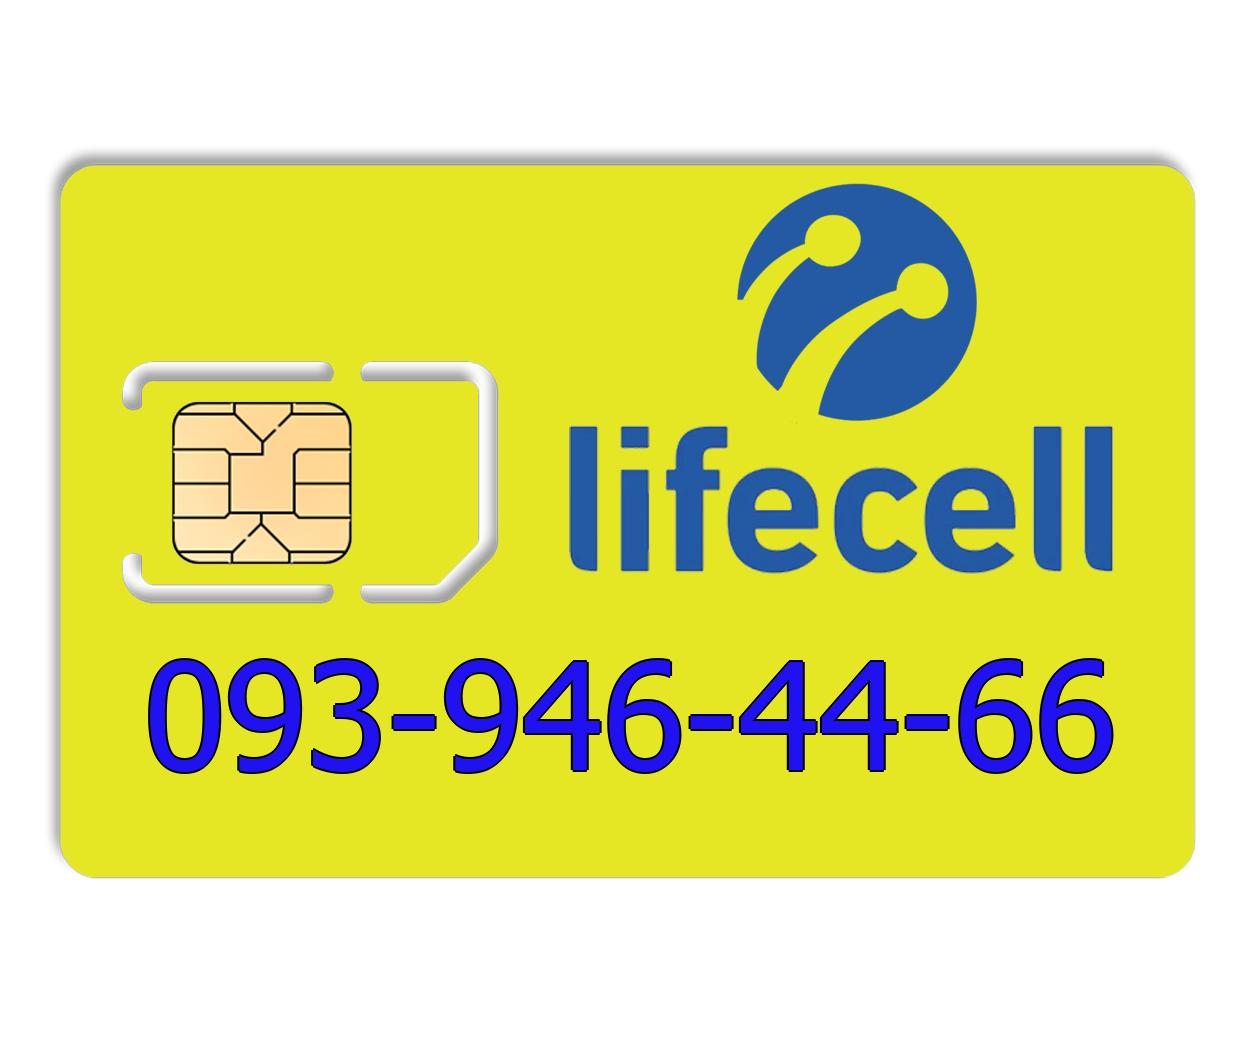 Красивий номер lifecell 093-946-44-66